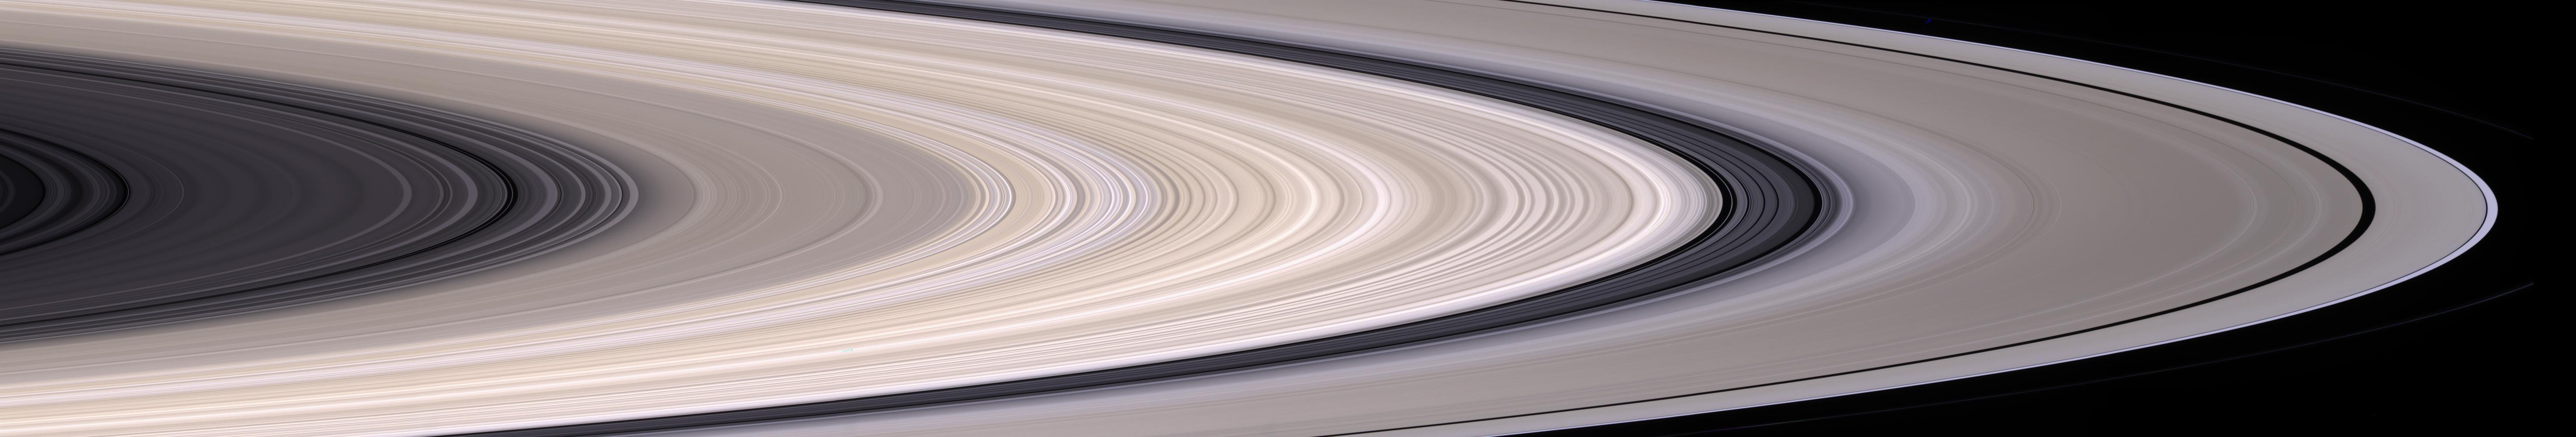 Saturn Rings Angle